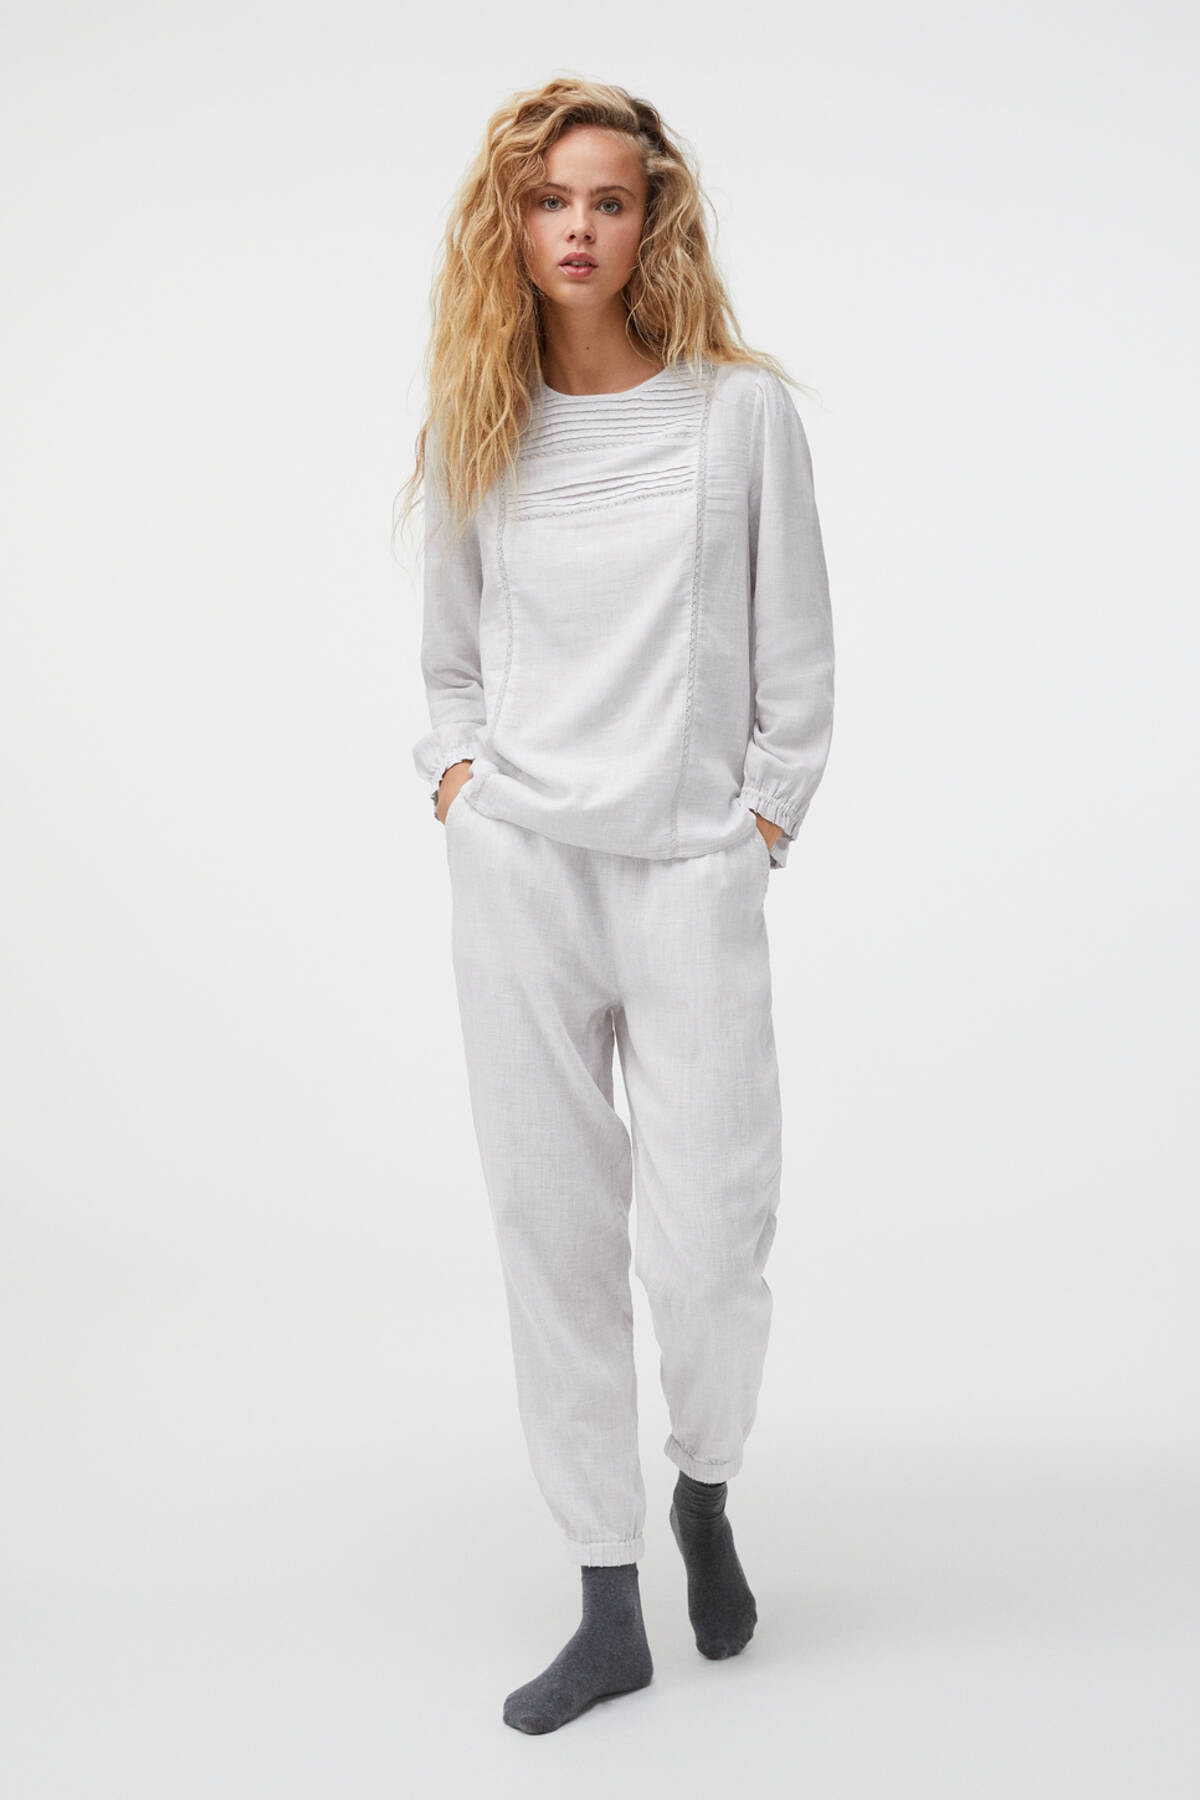 Oysho Kadın Açik Gri %100 Pamuklu Işlemeli Gri Pantolon